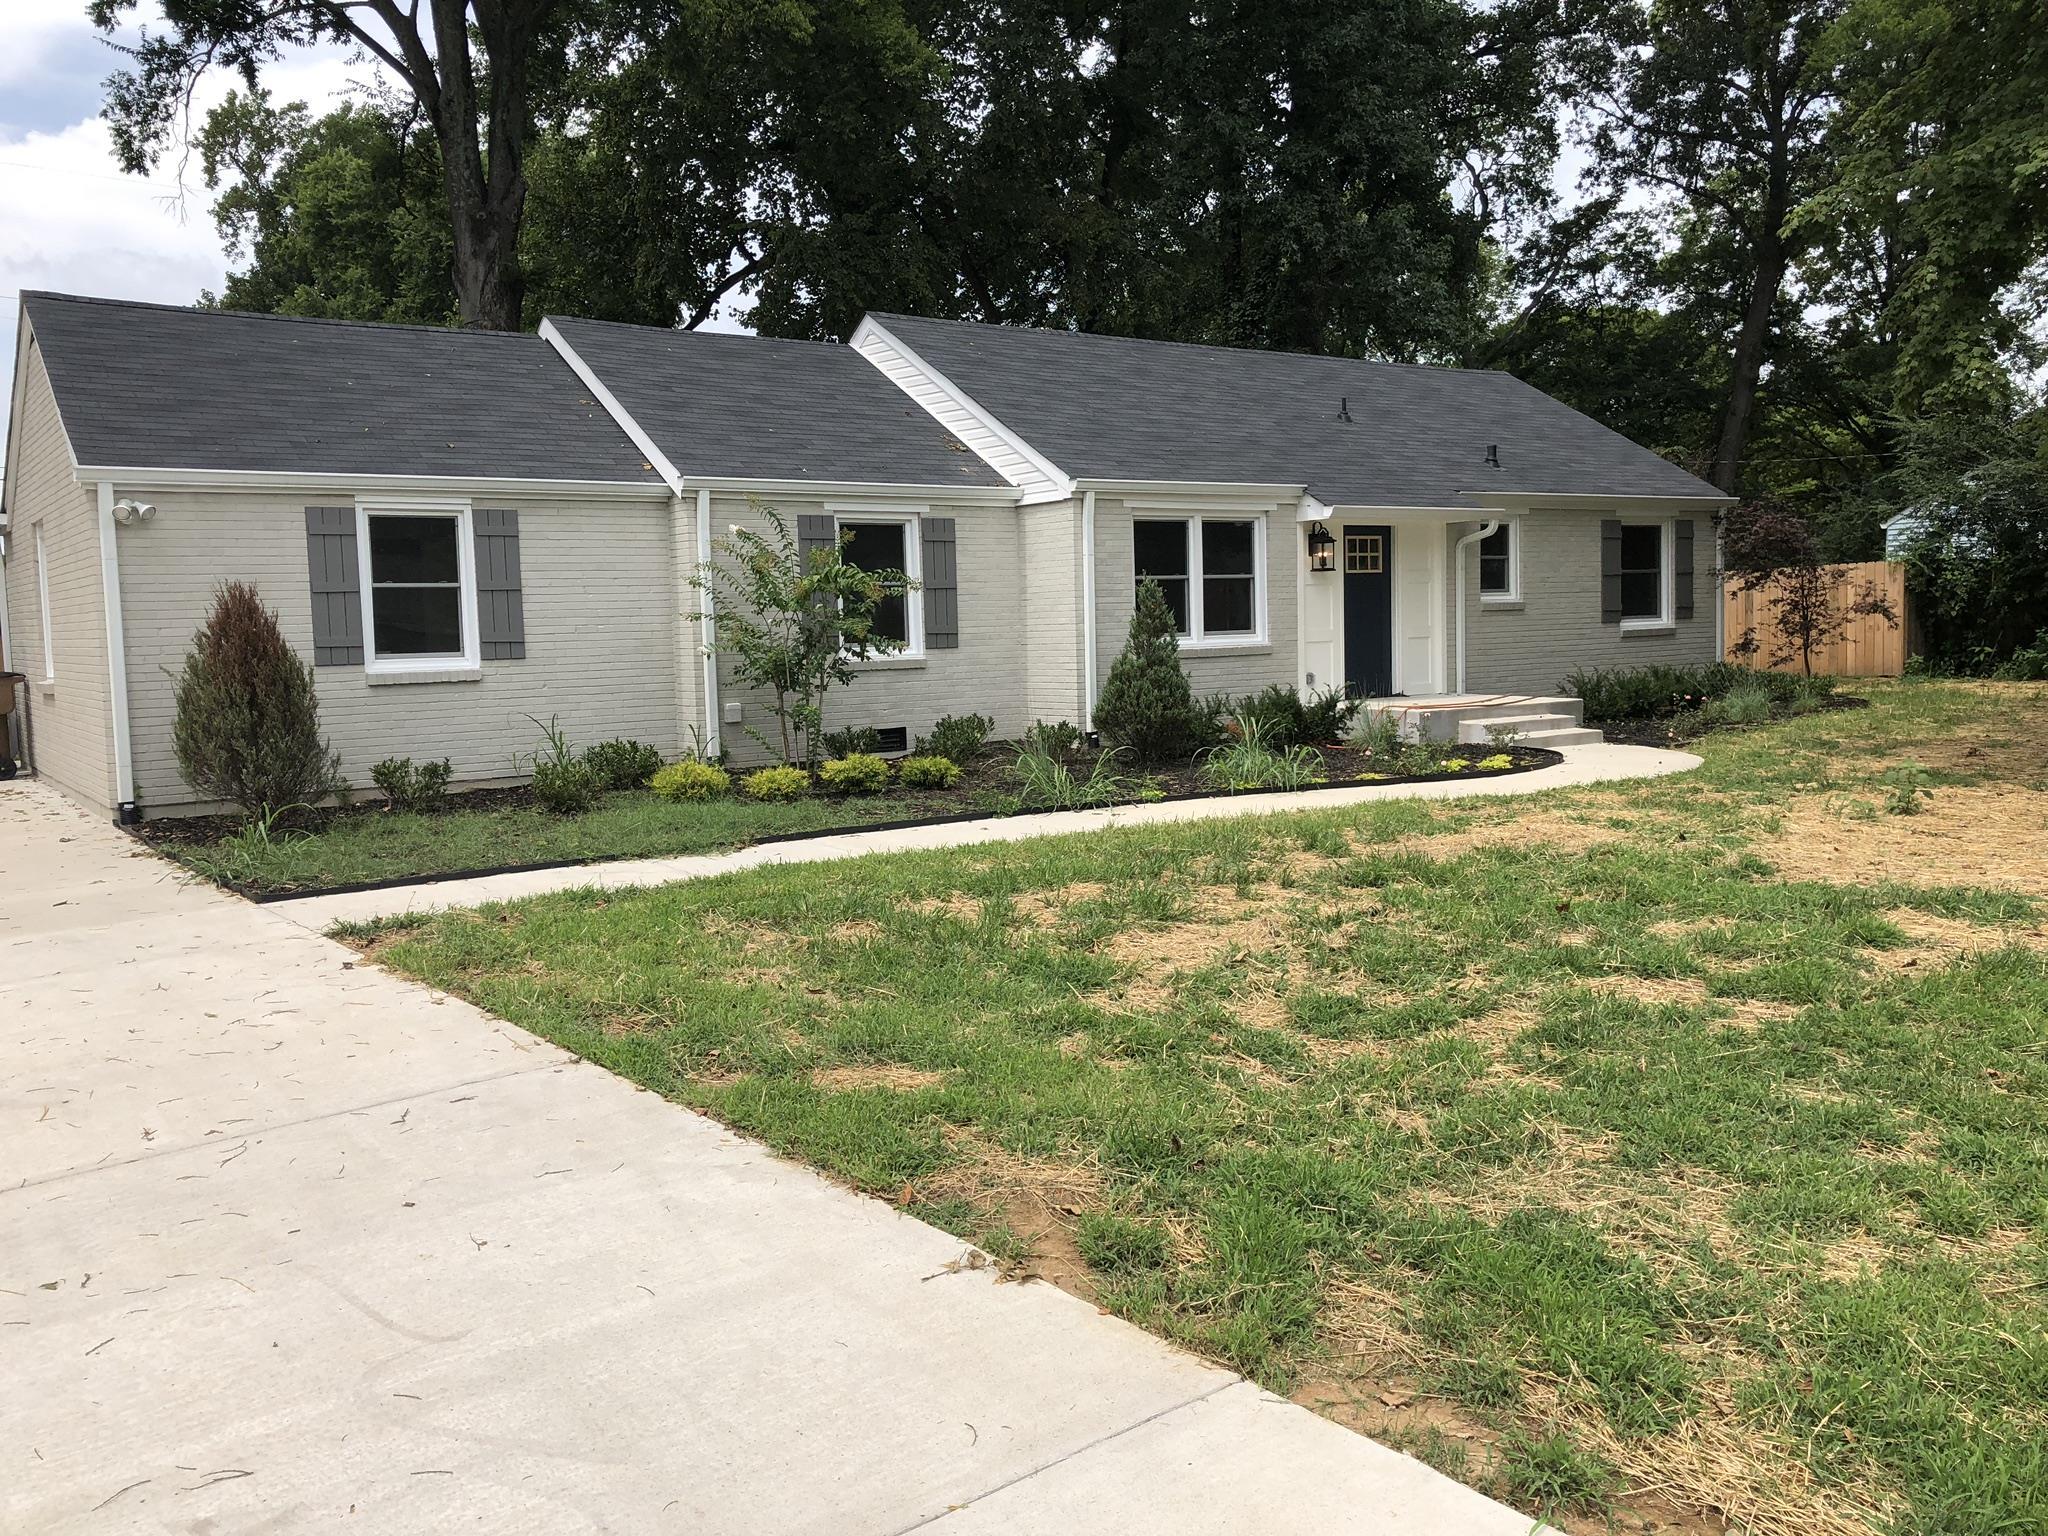 306 Rachel Rd, Nashville, TN 37214 - Nashville, TN real estate listing